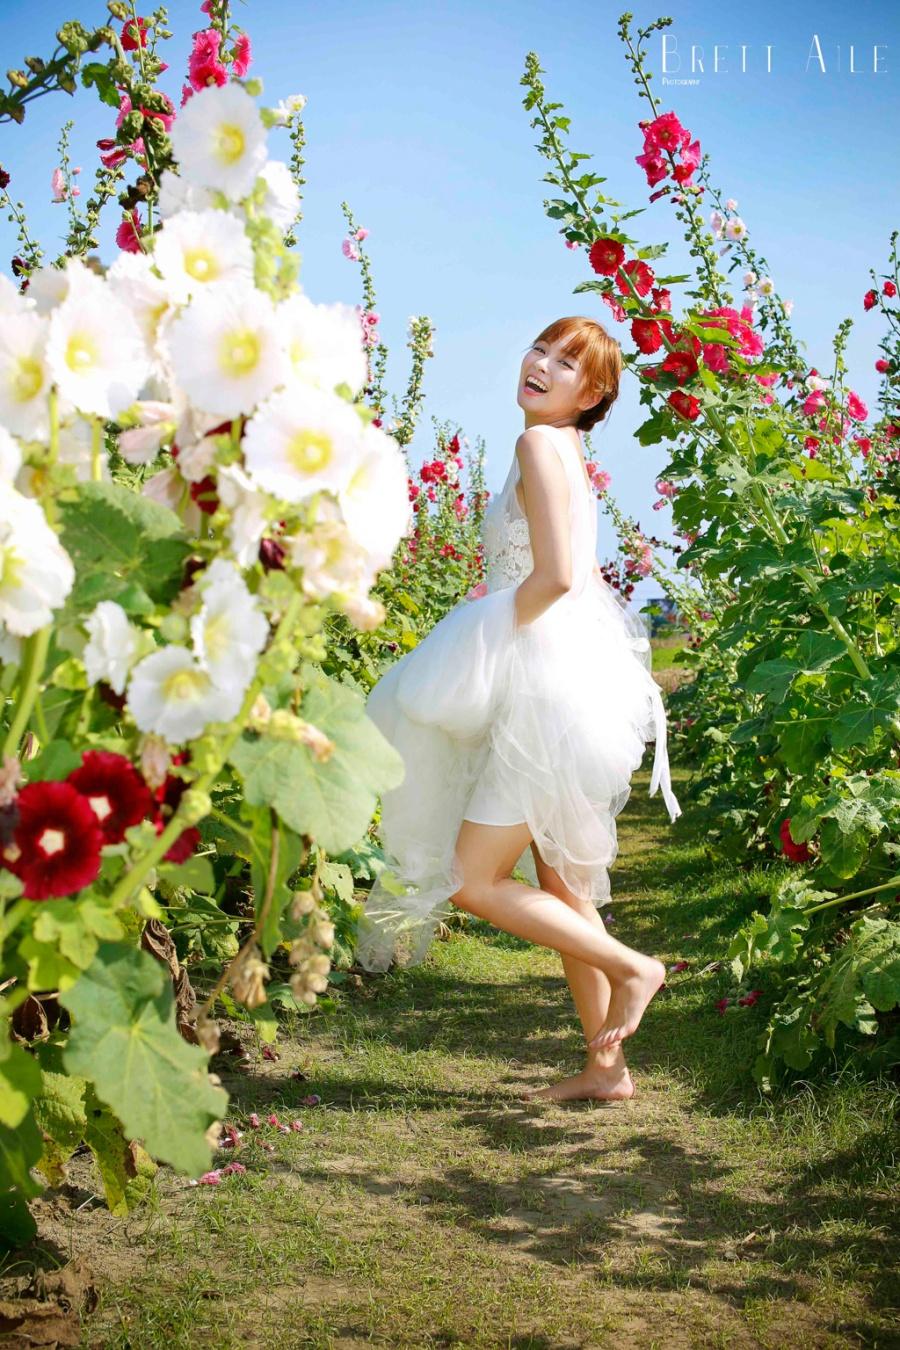 海外婚紗攝影推薦 香港日本台灣韓國歐洲 OVERSEAS PRE-WEDDING PHOTOGRAPHY PACKAGES coolstylist-58